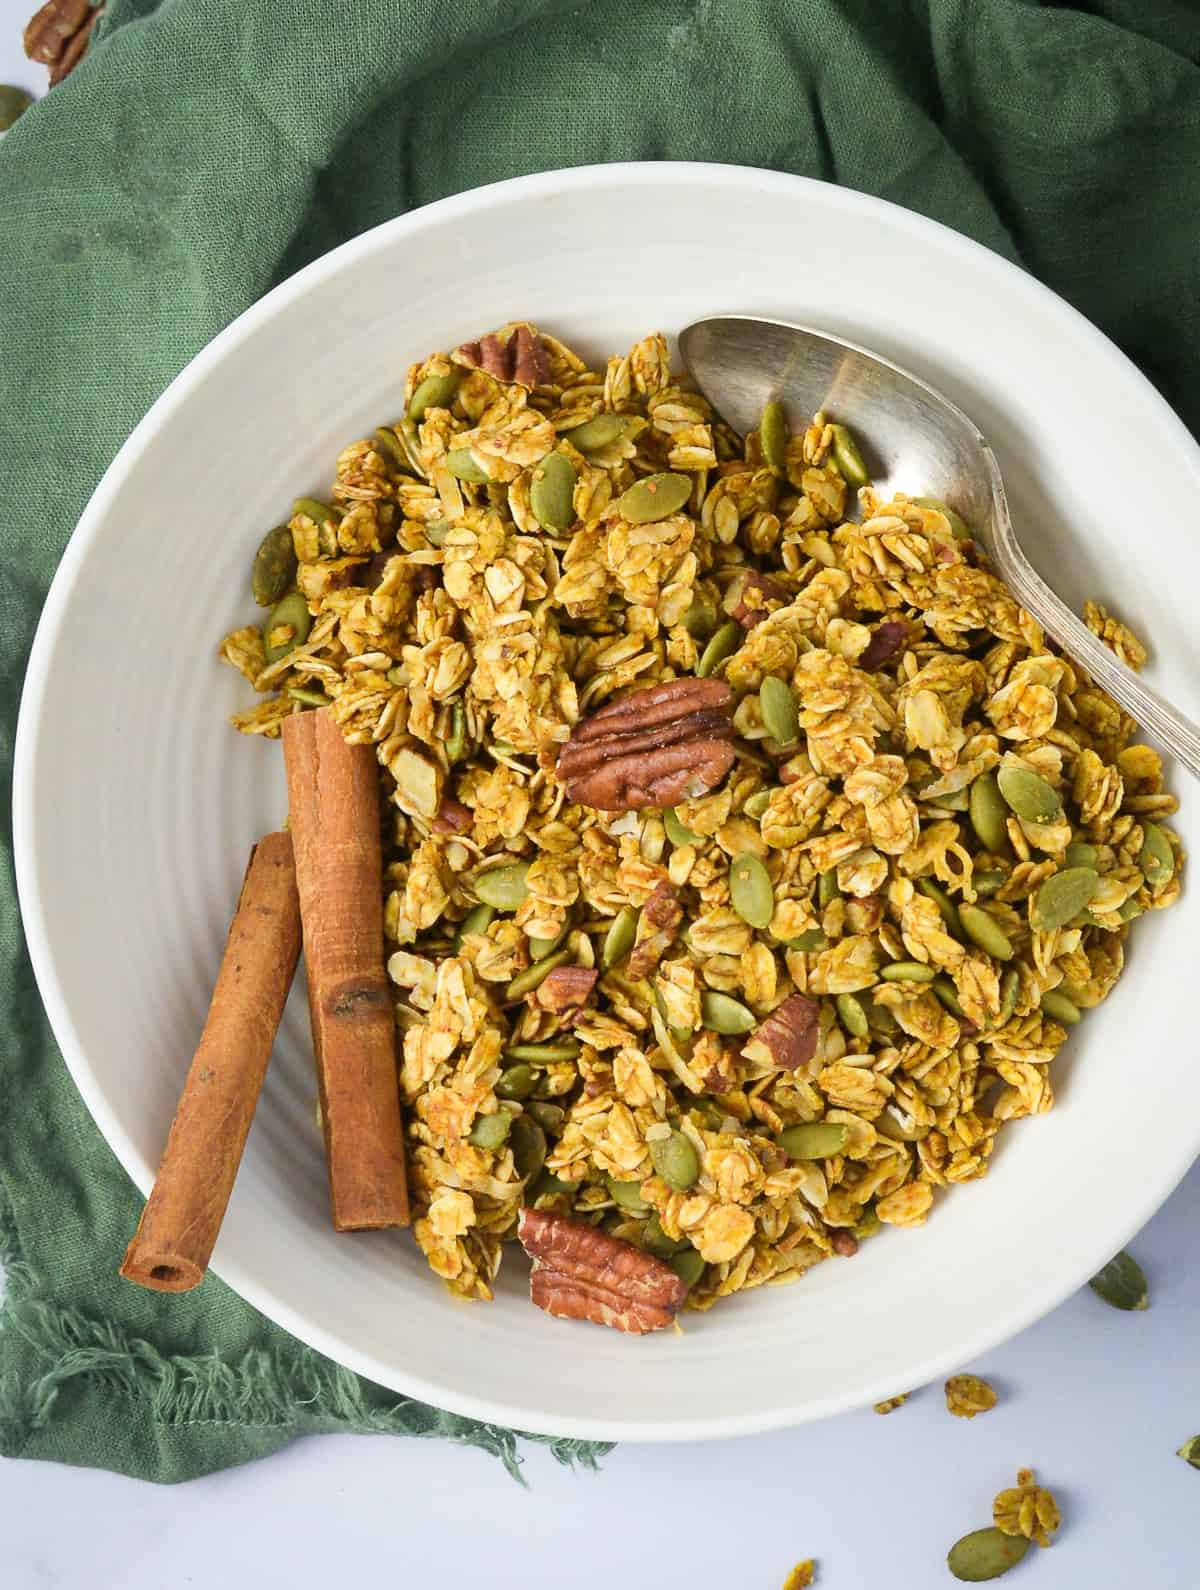 Vegan pumpkin granola in bowl with pecans and cinnamon sticks.